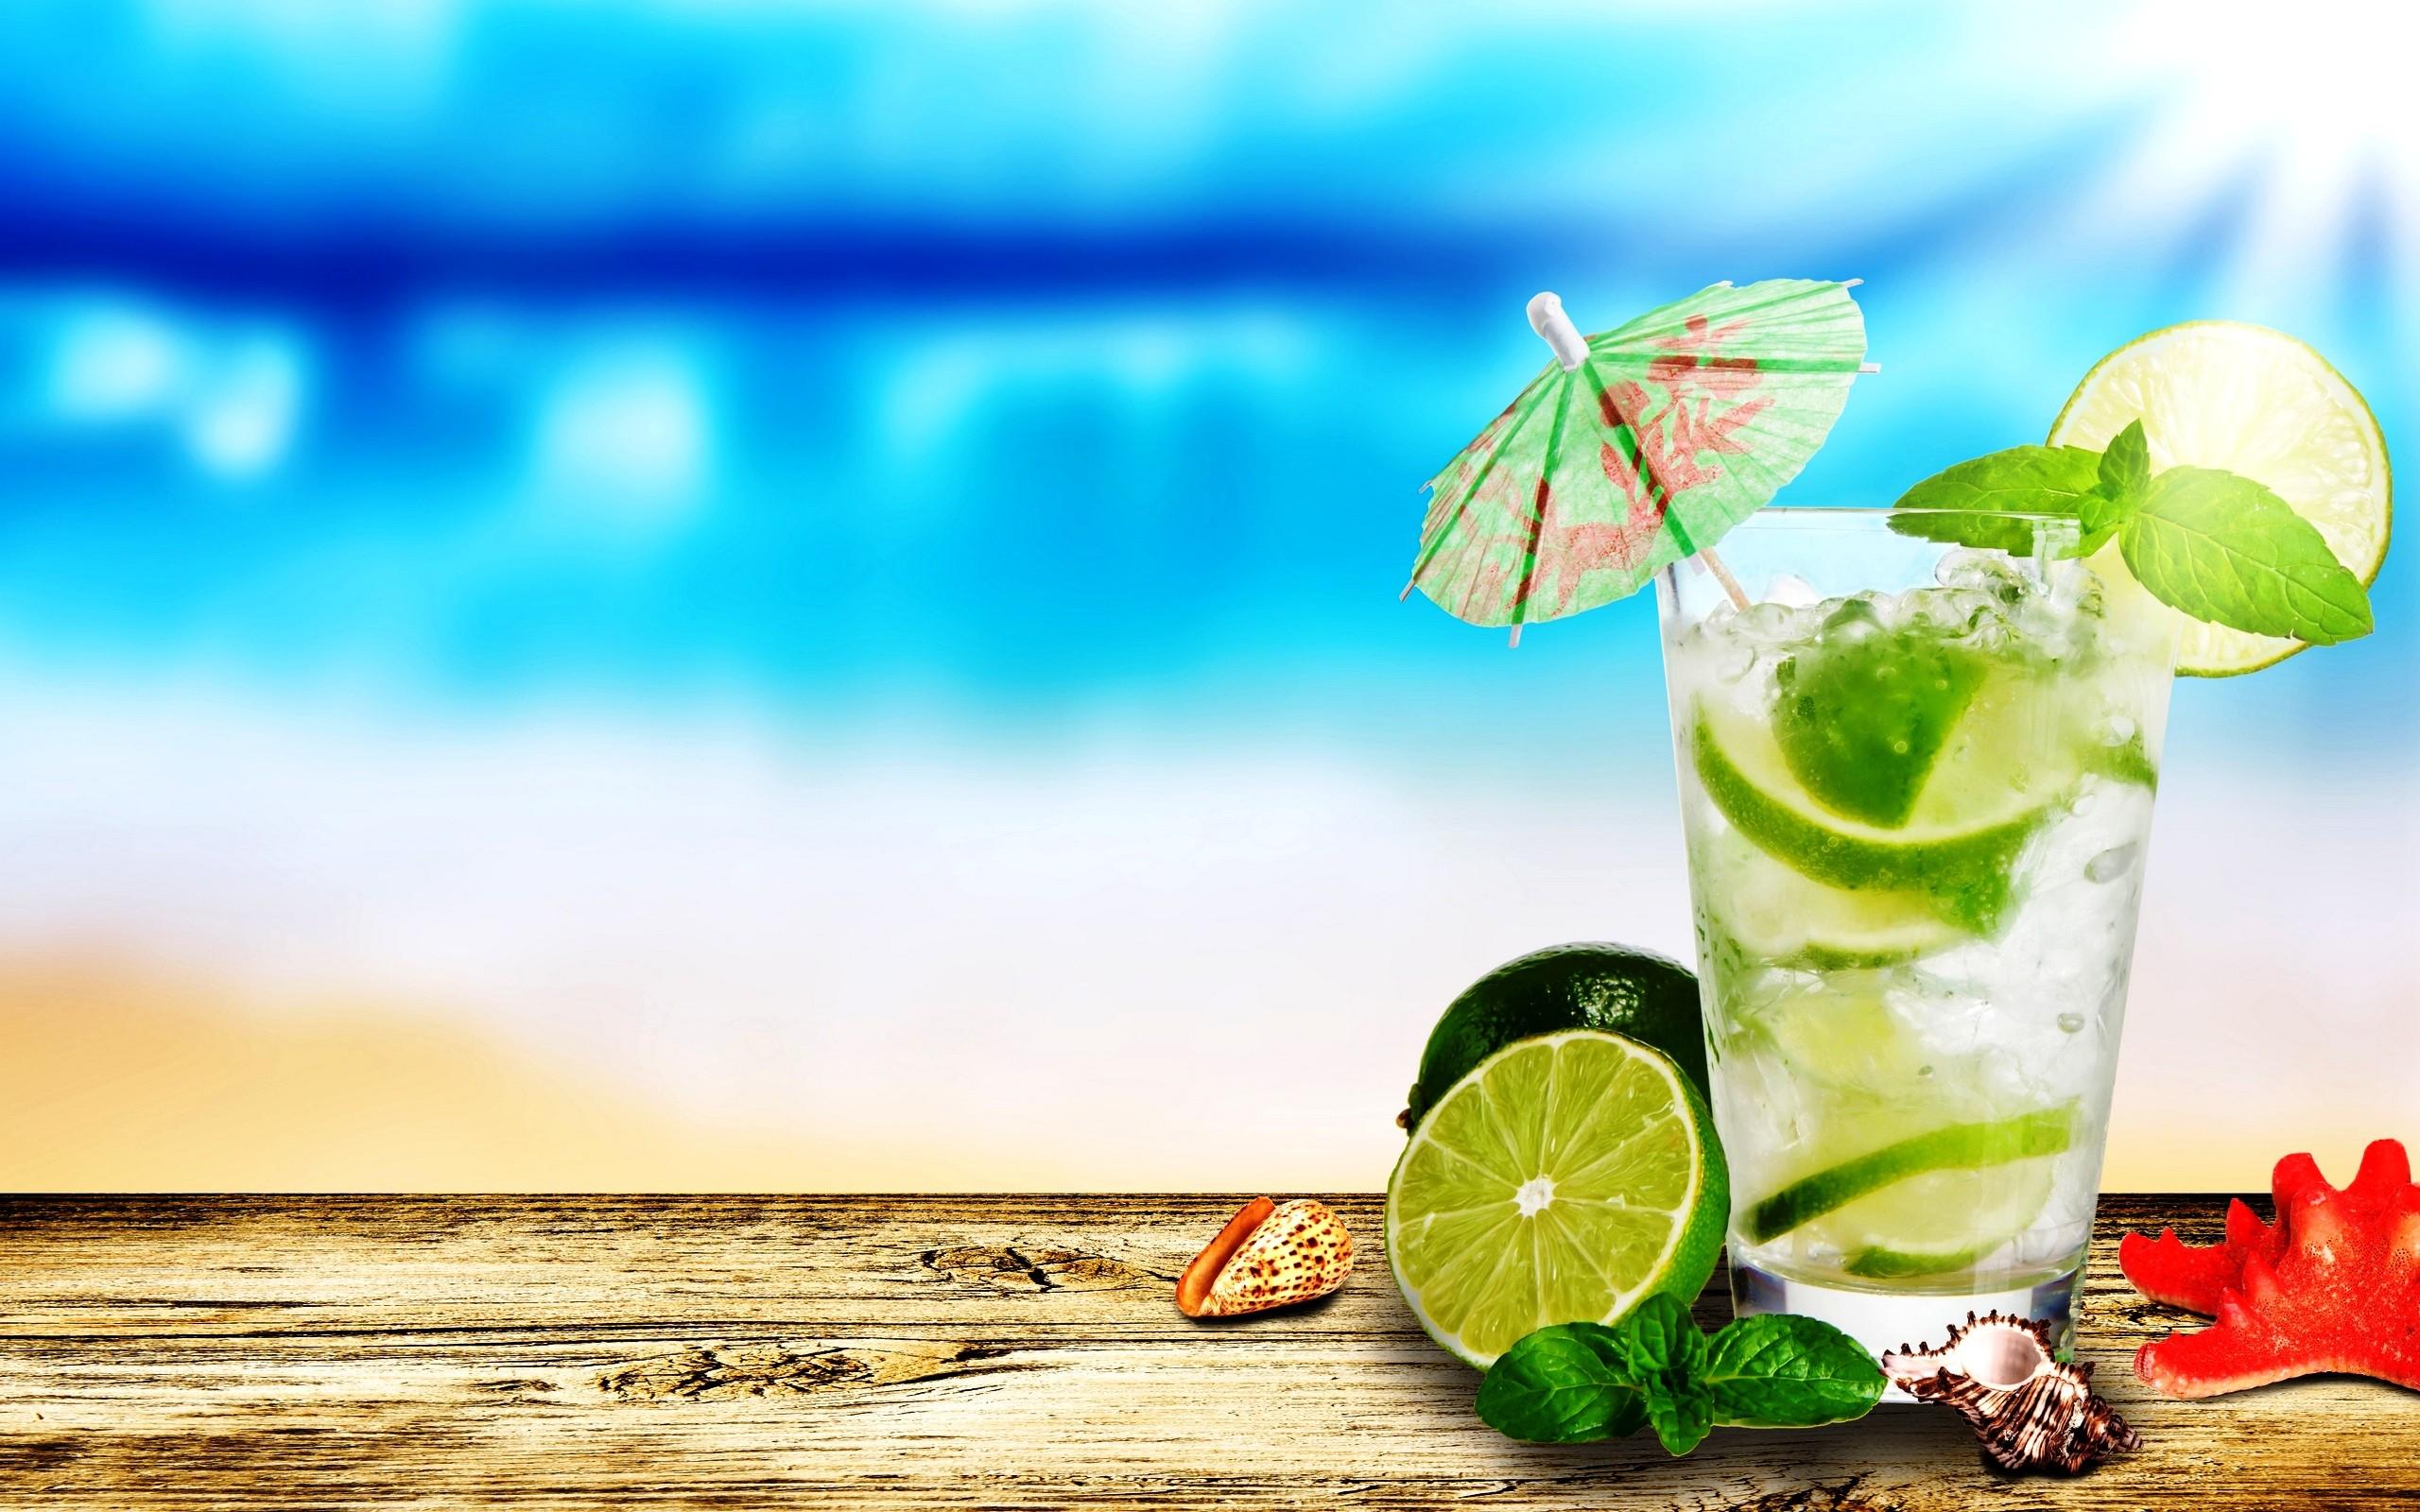 … Free Summer Screensavers And Wallpaper Cocktail Free Summer Screensavers  And Wallpaper …